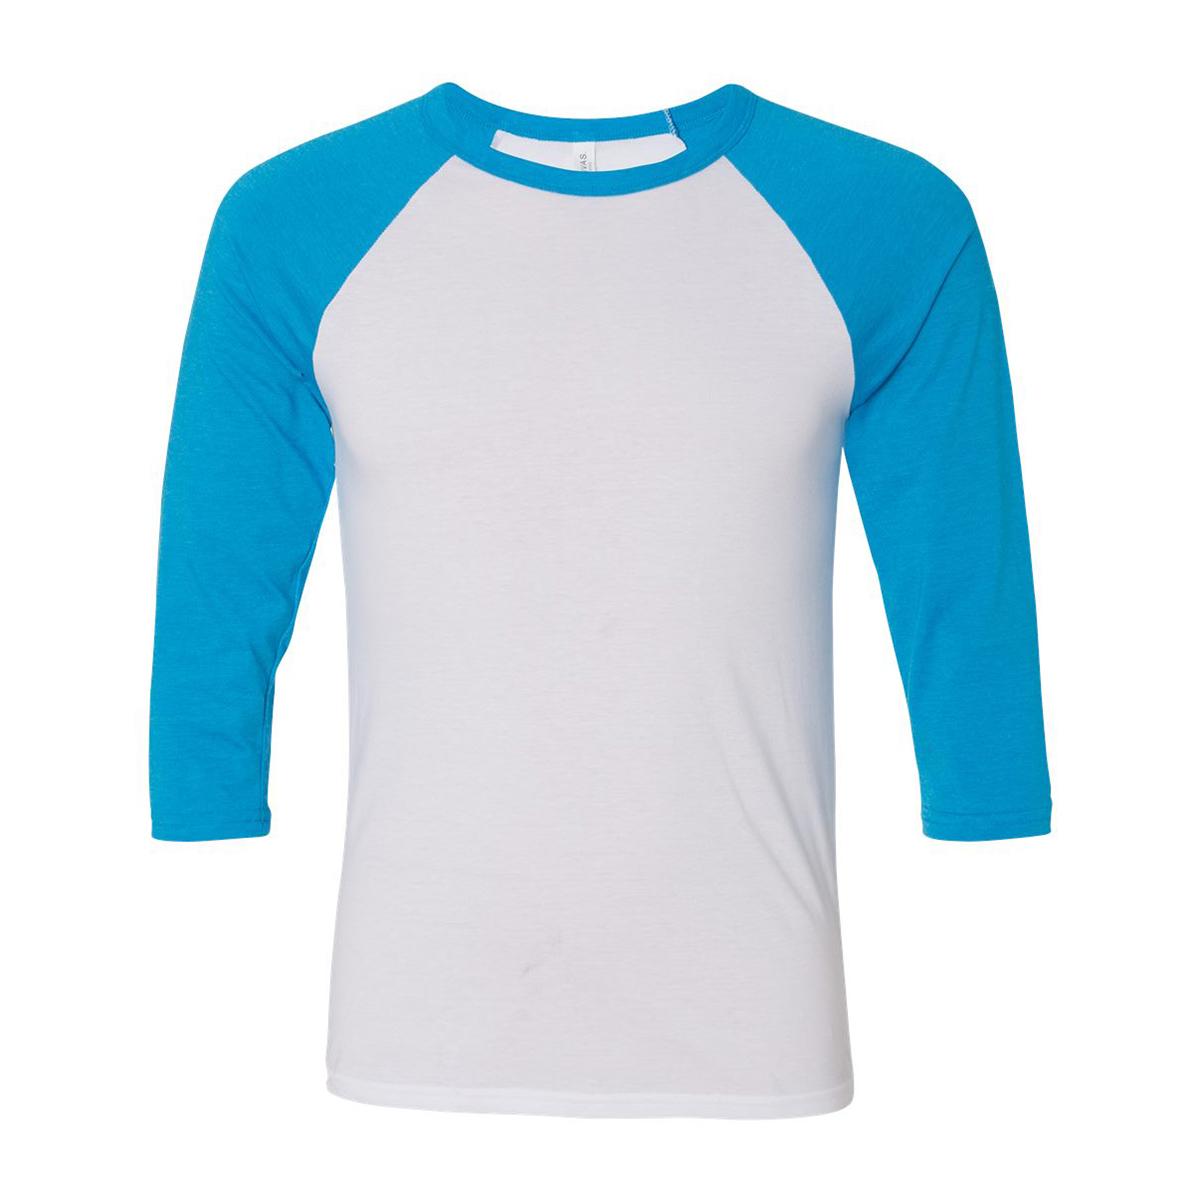 White neon blue